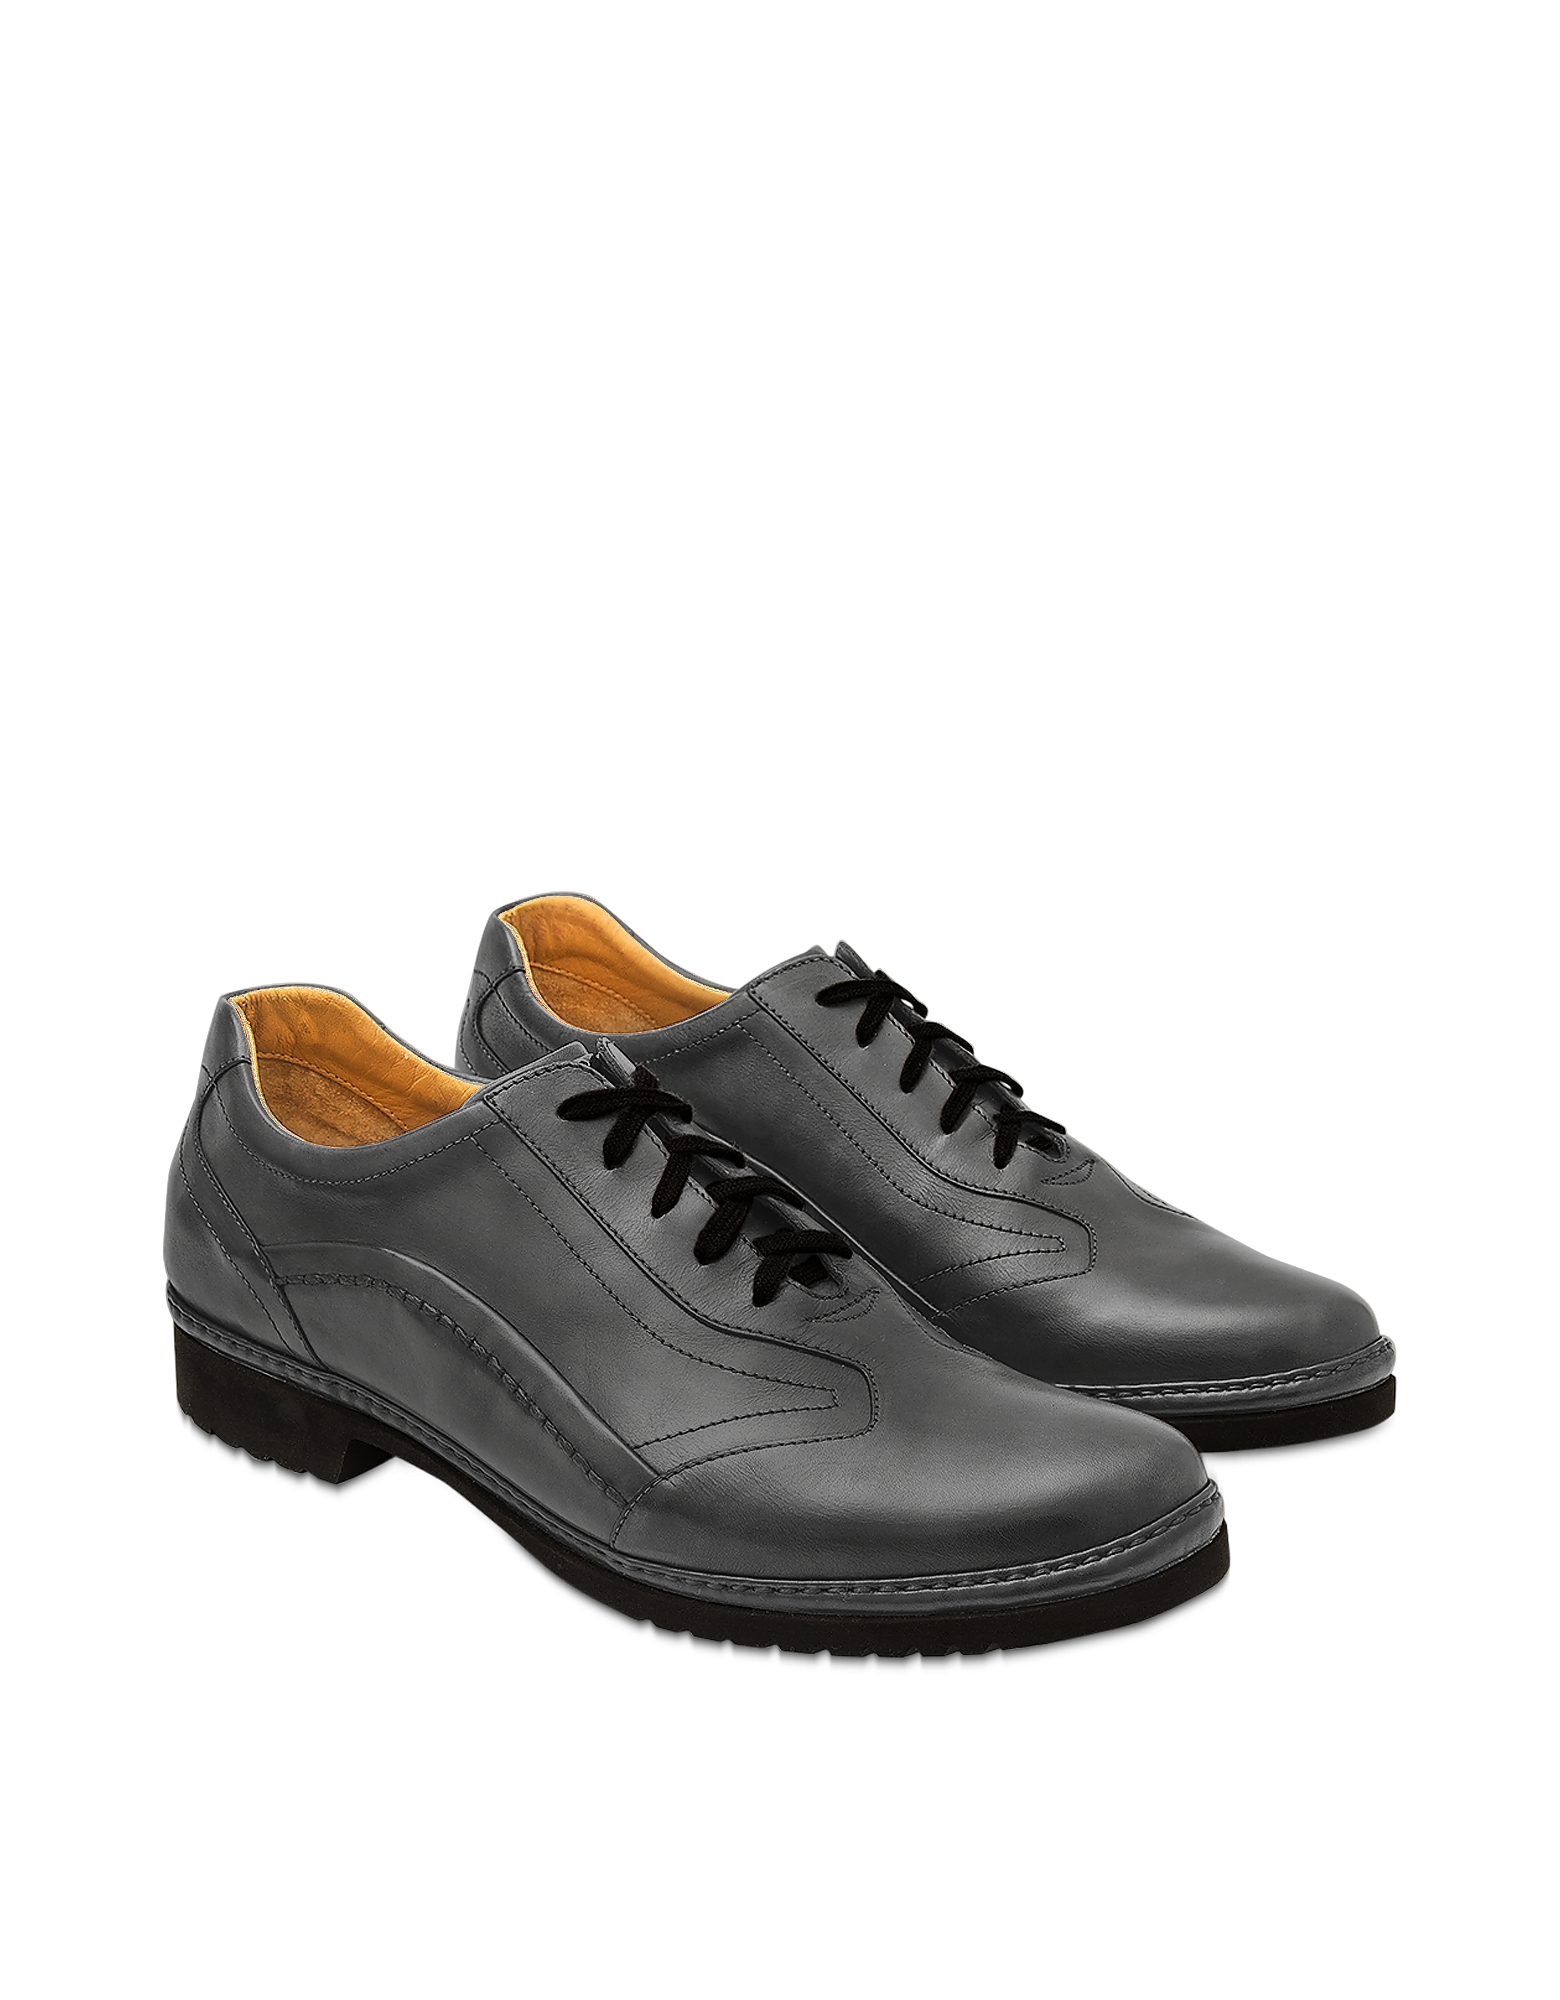 Pakerson 帕克森 鞋履, Smoke意大利手工皮革系带鞋